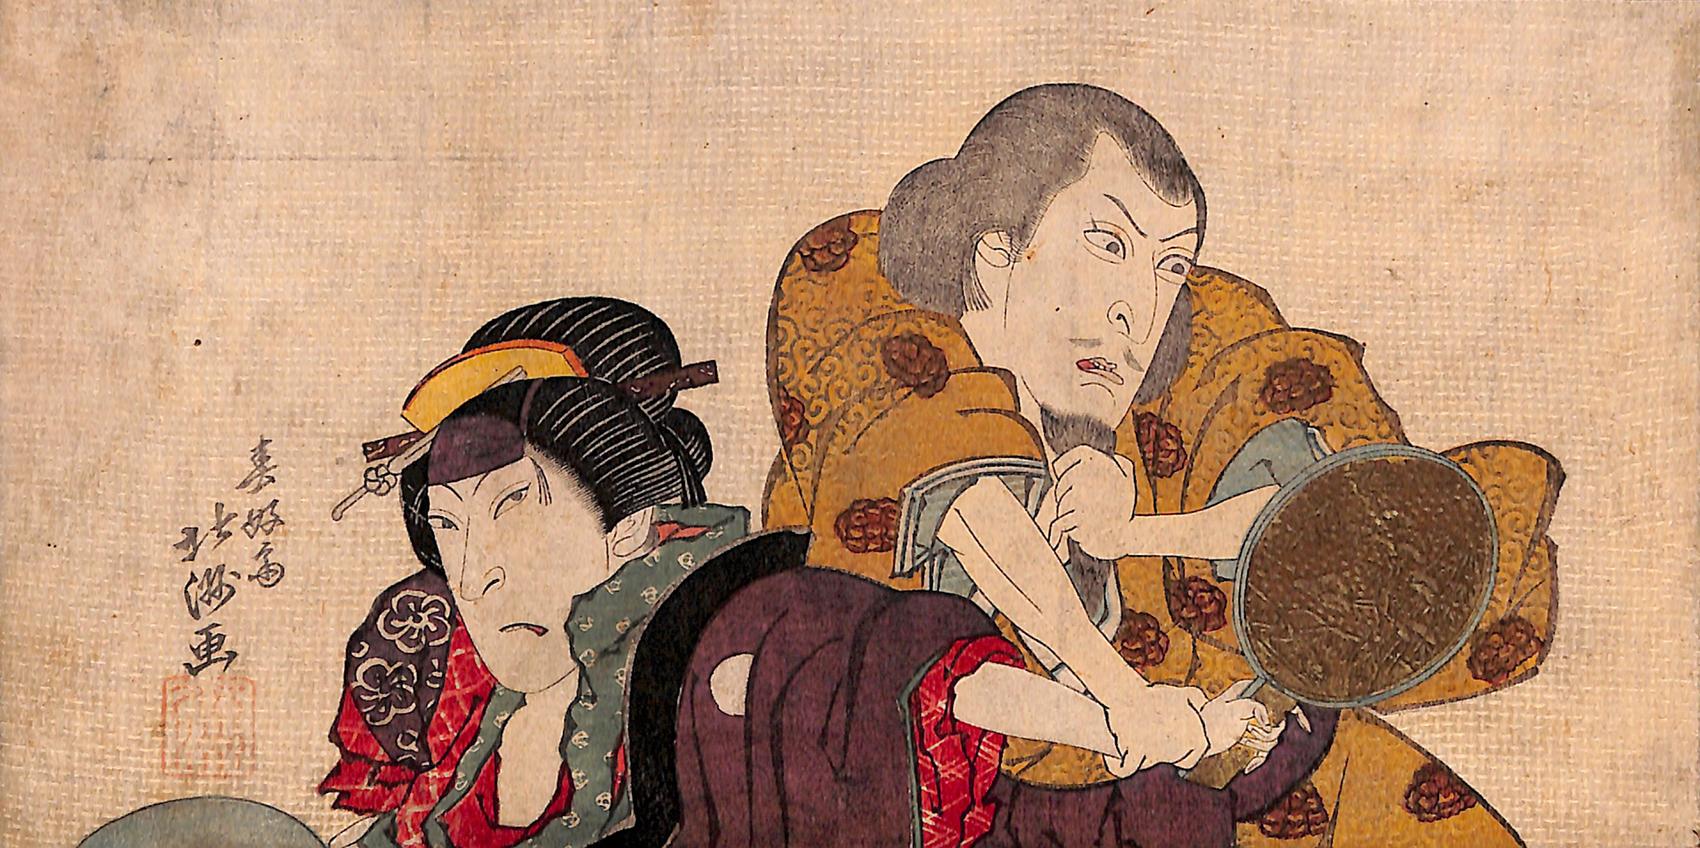 Shunkōsai Hokushū, Actors Nakamura Utaemon III (Shikan) as Shunkan and Nakamura Matsue III as Oyasu, 1825, Woodblock print. Smart Museum of Art, The University of Chicago, The Brooks McCormick Jr. Collection of Japanese Prints, 2015.794.